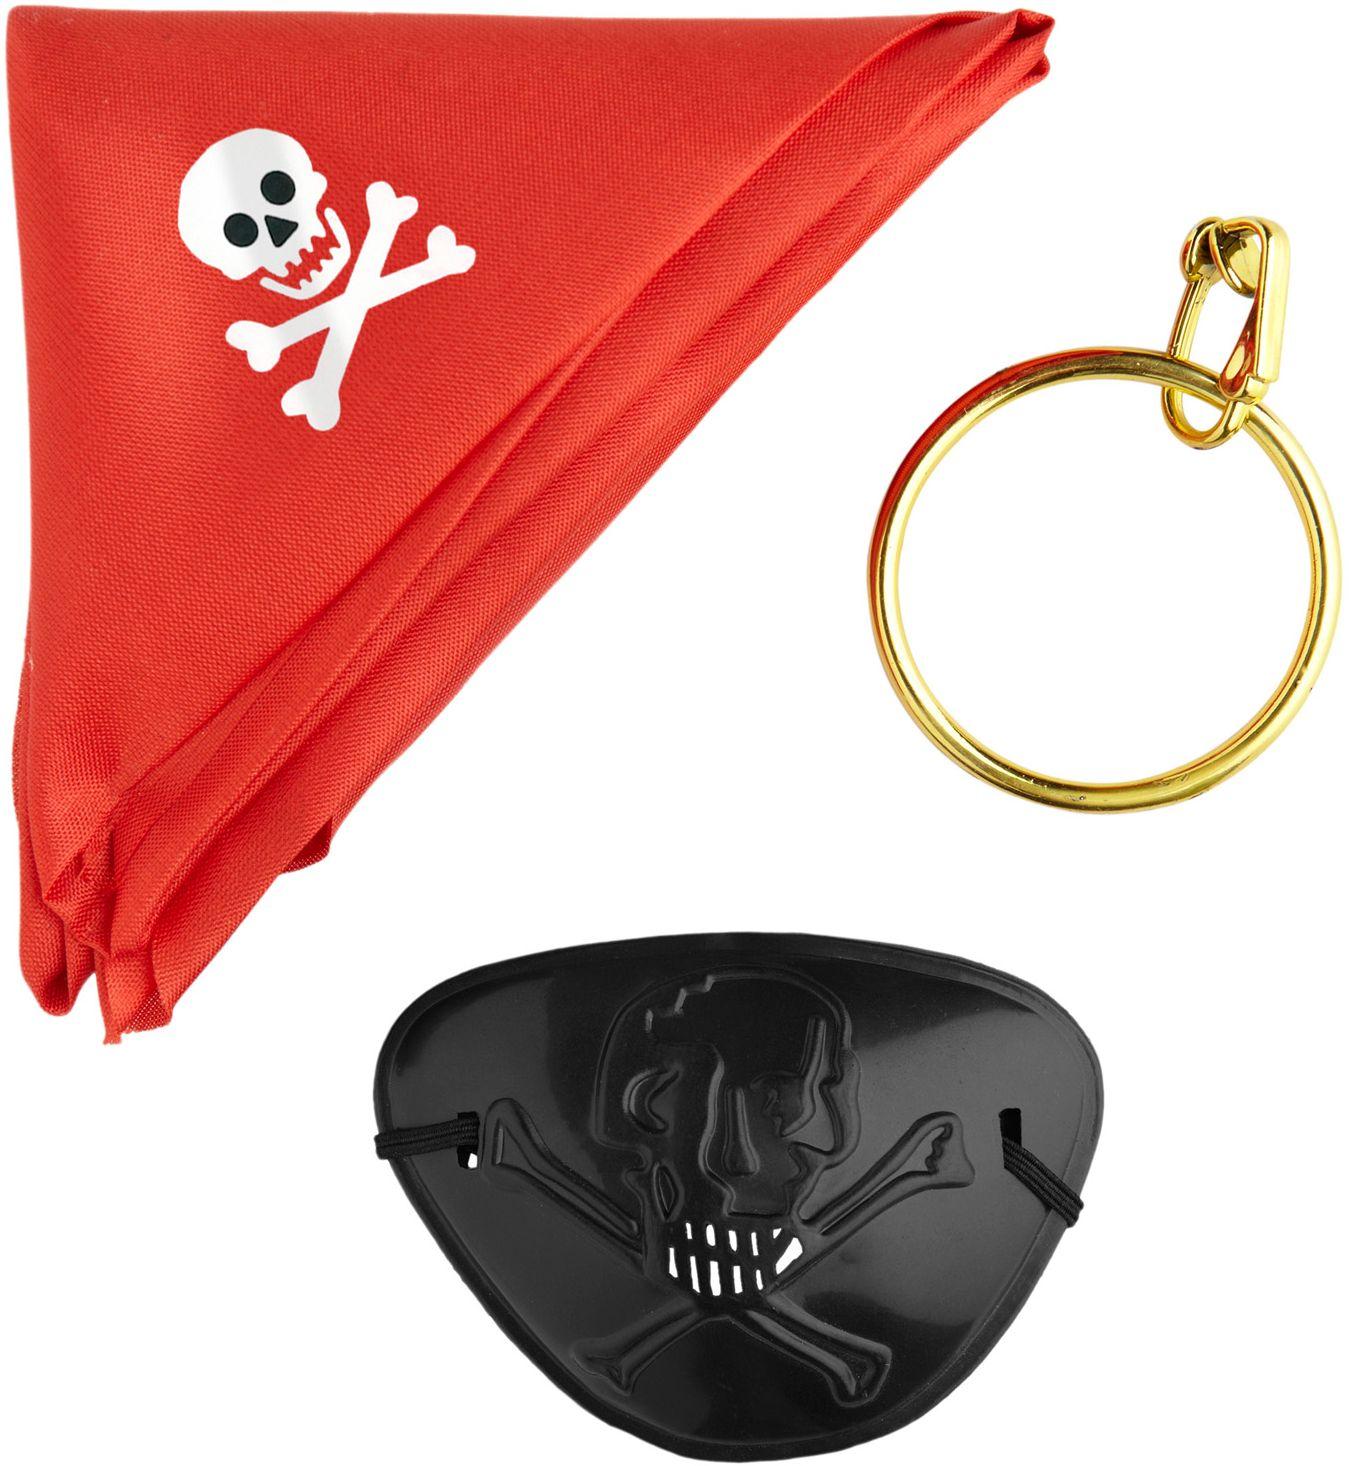 Piraat accessoires set